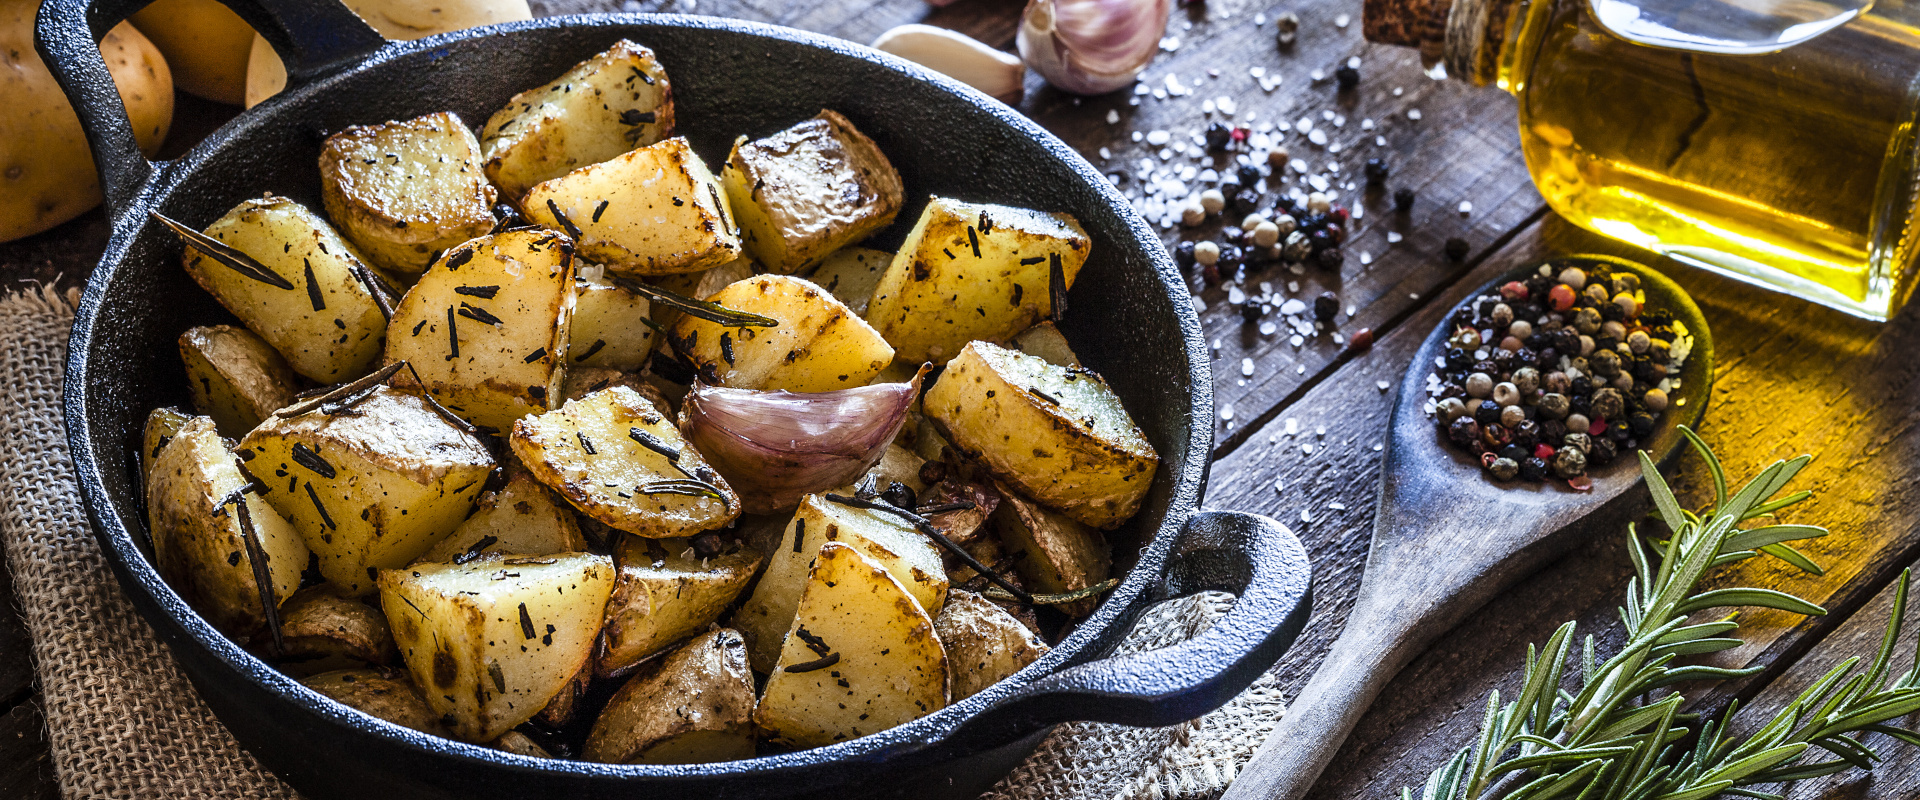 rozmaringos krumpli cover